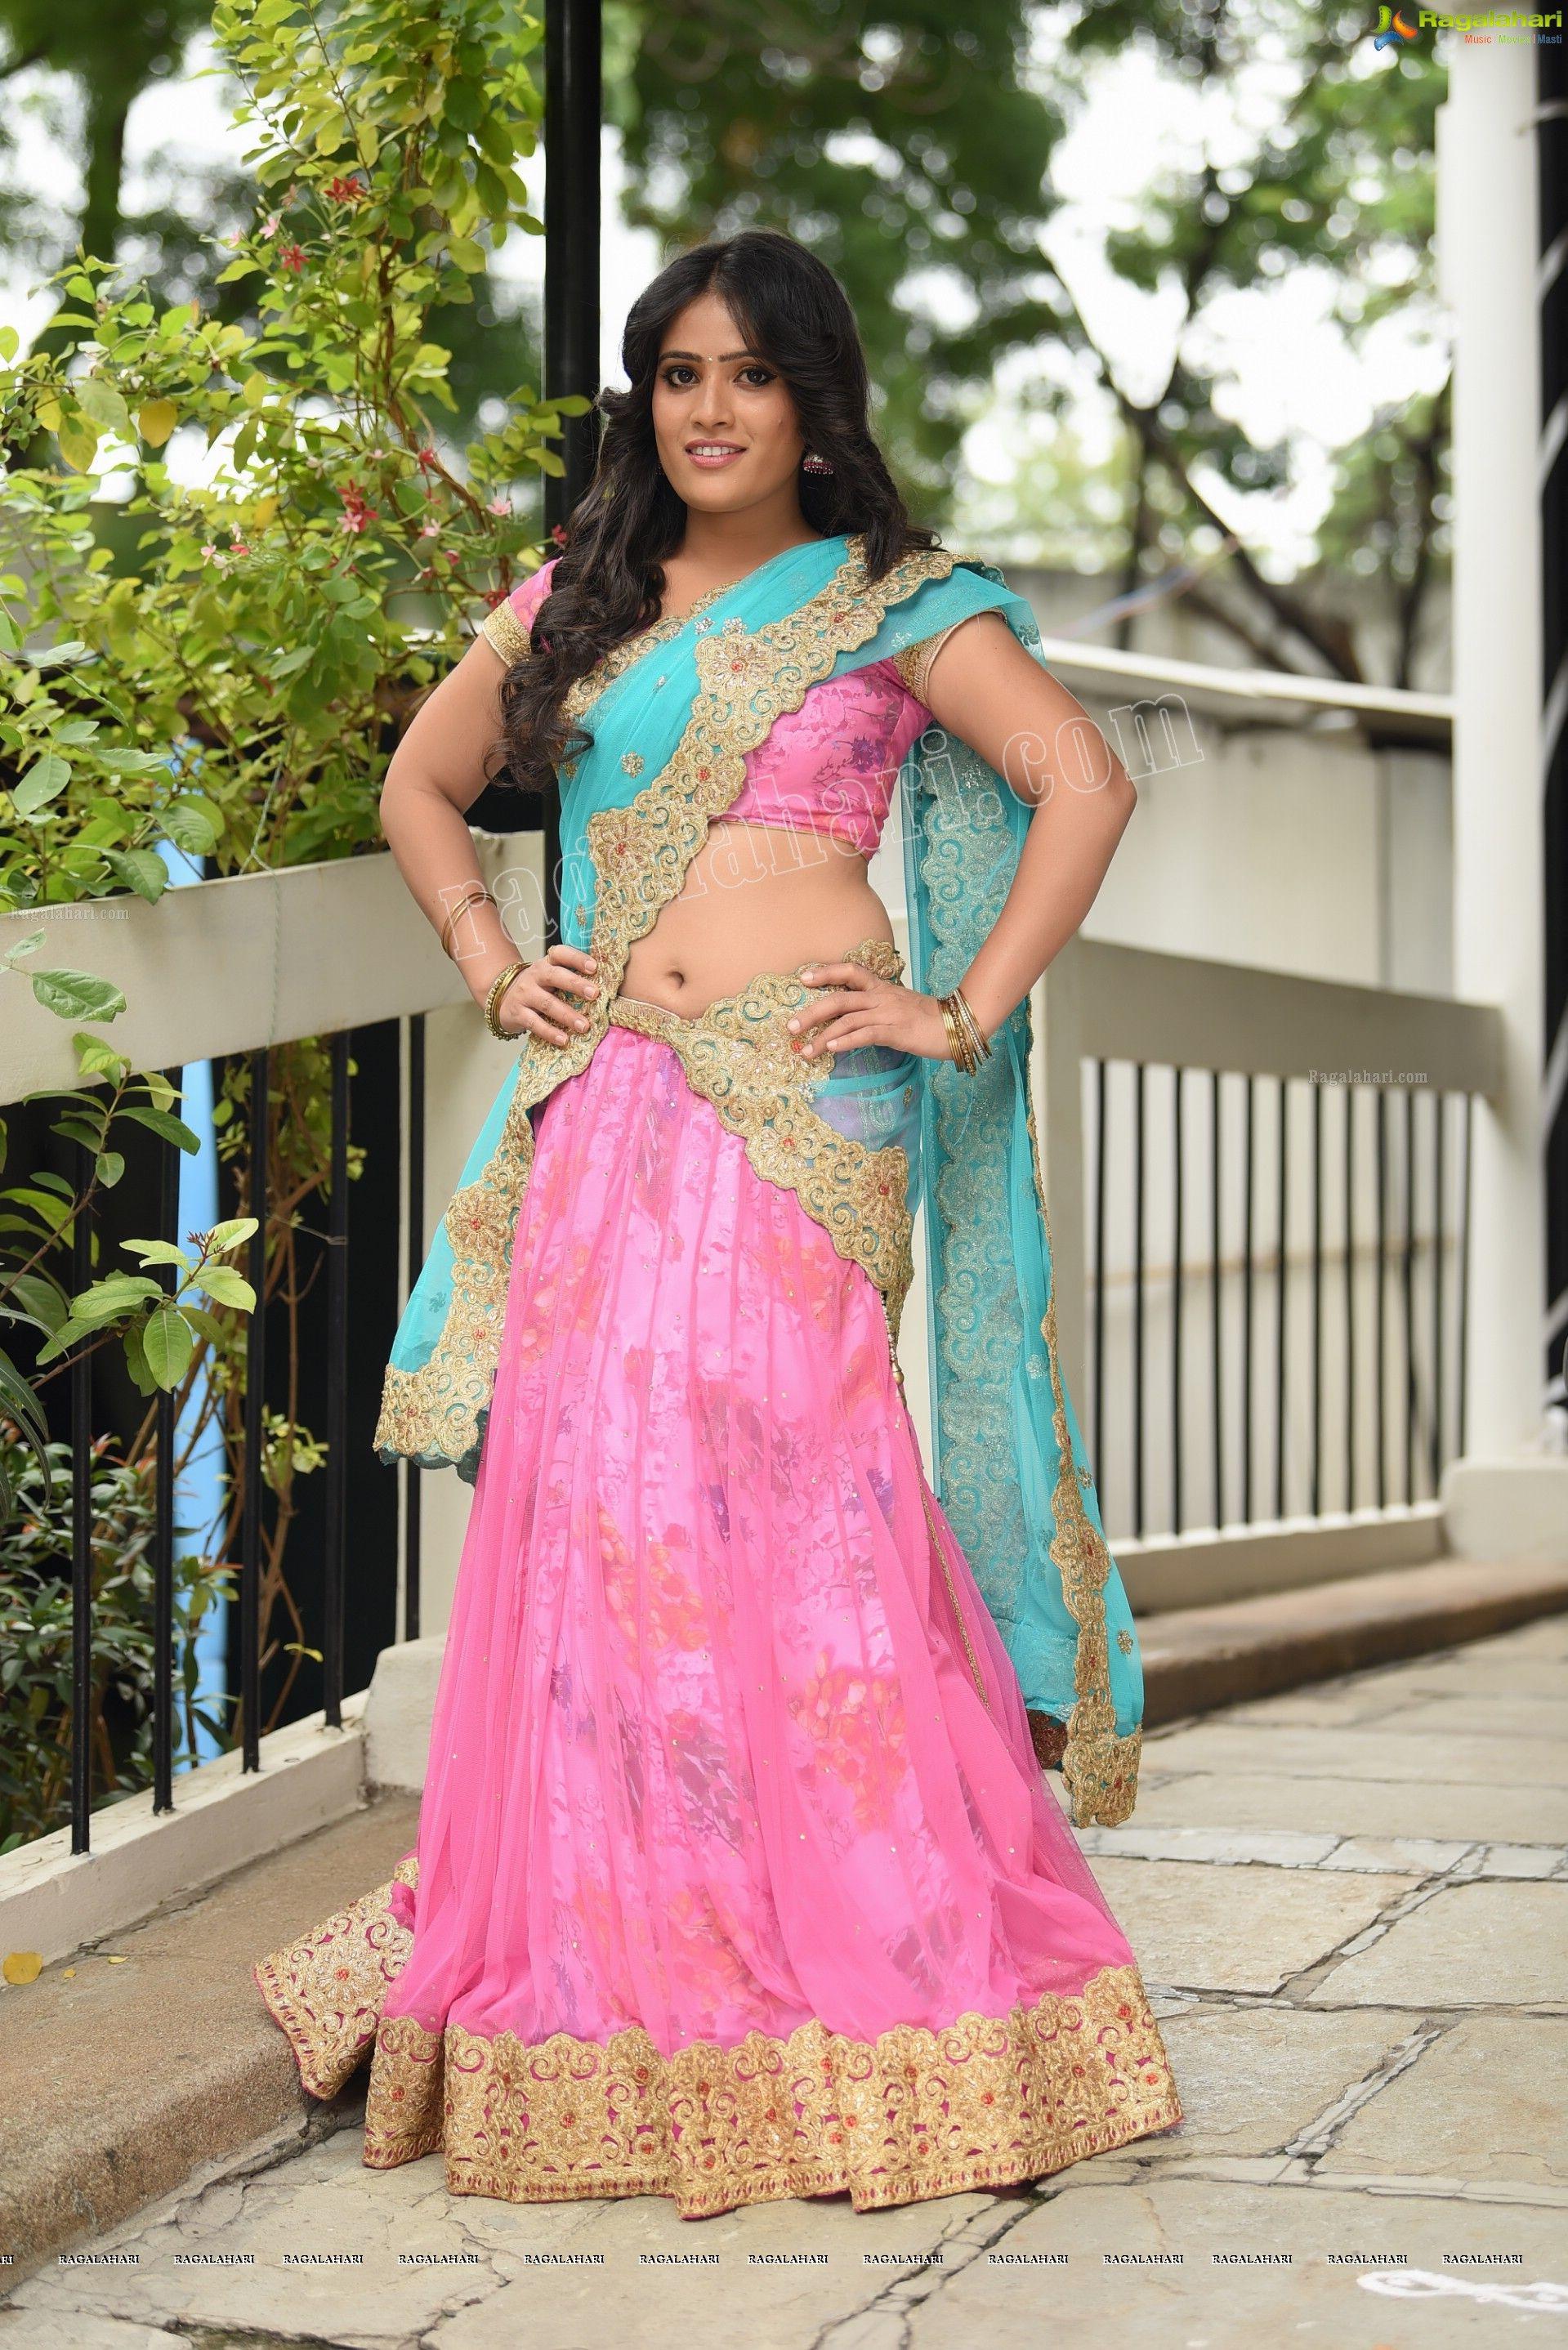 Anusha Parada (Exclusive Photoshoot) (High Definition